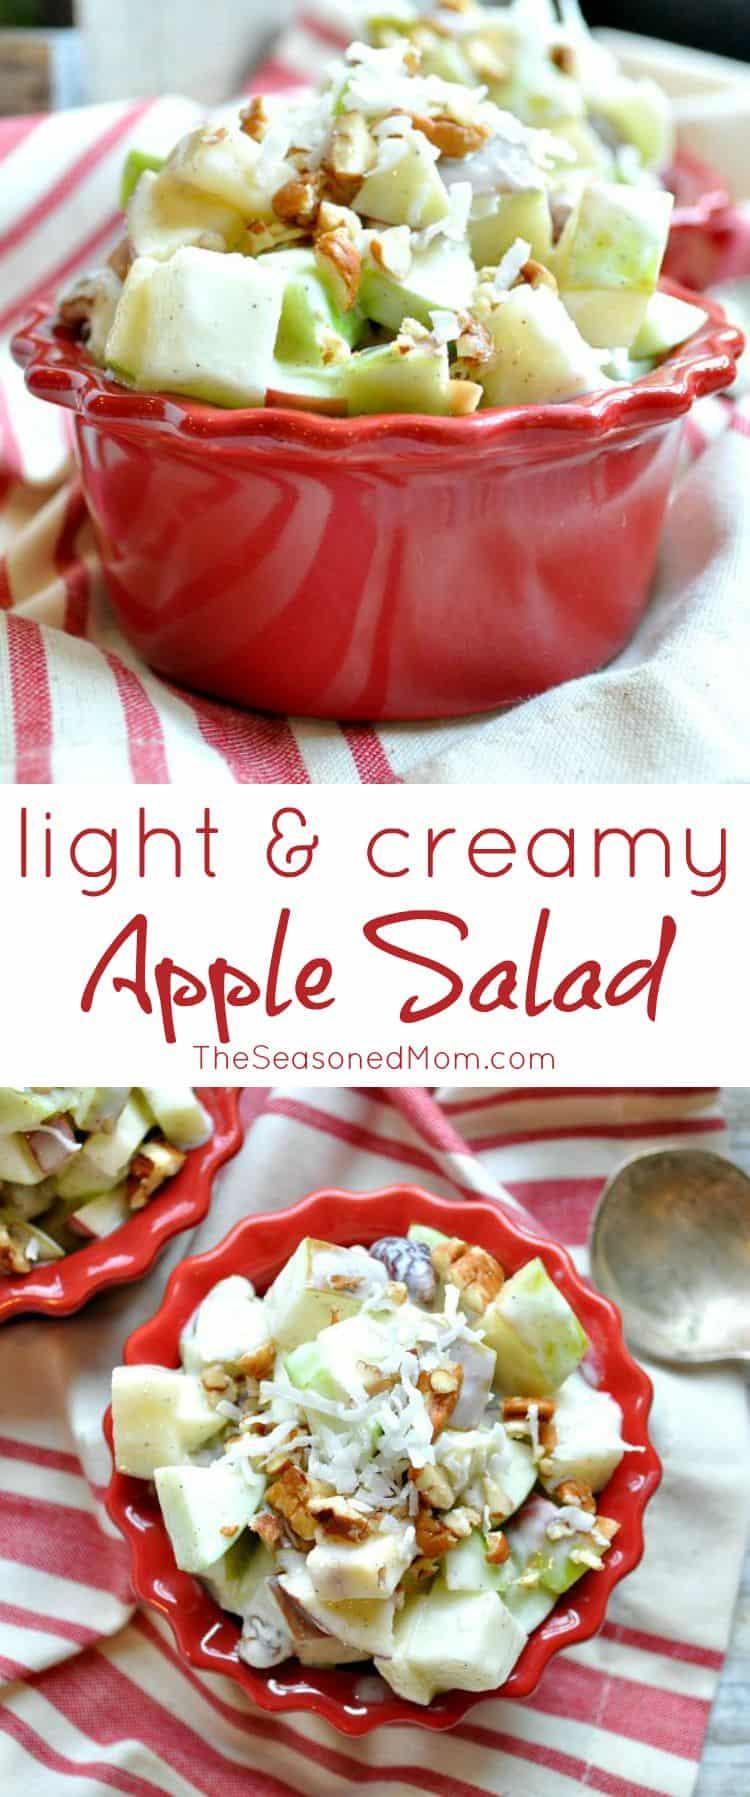 Light and Creamy Apple Salad